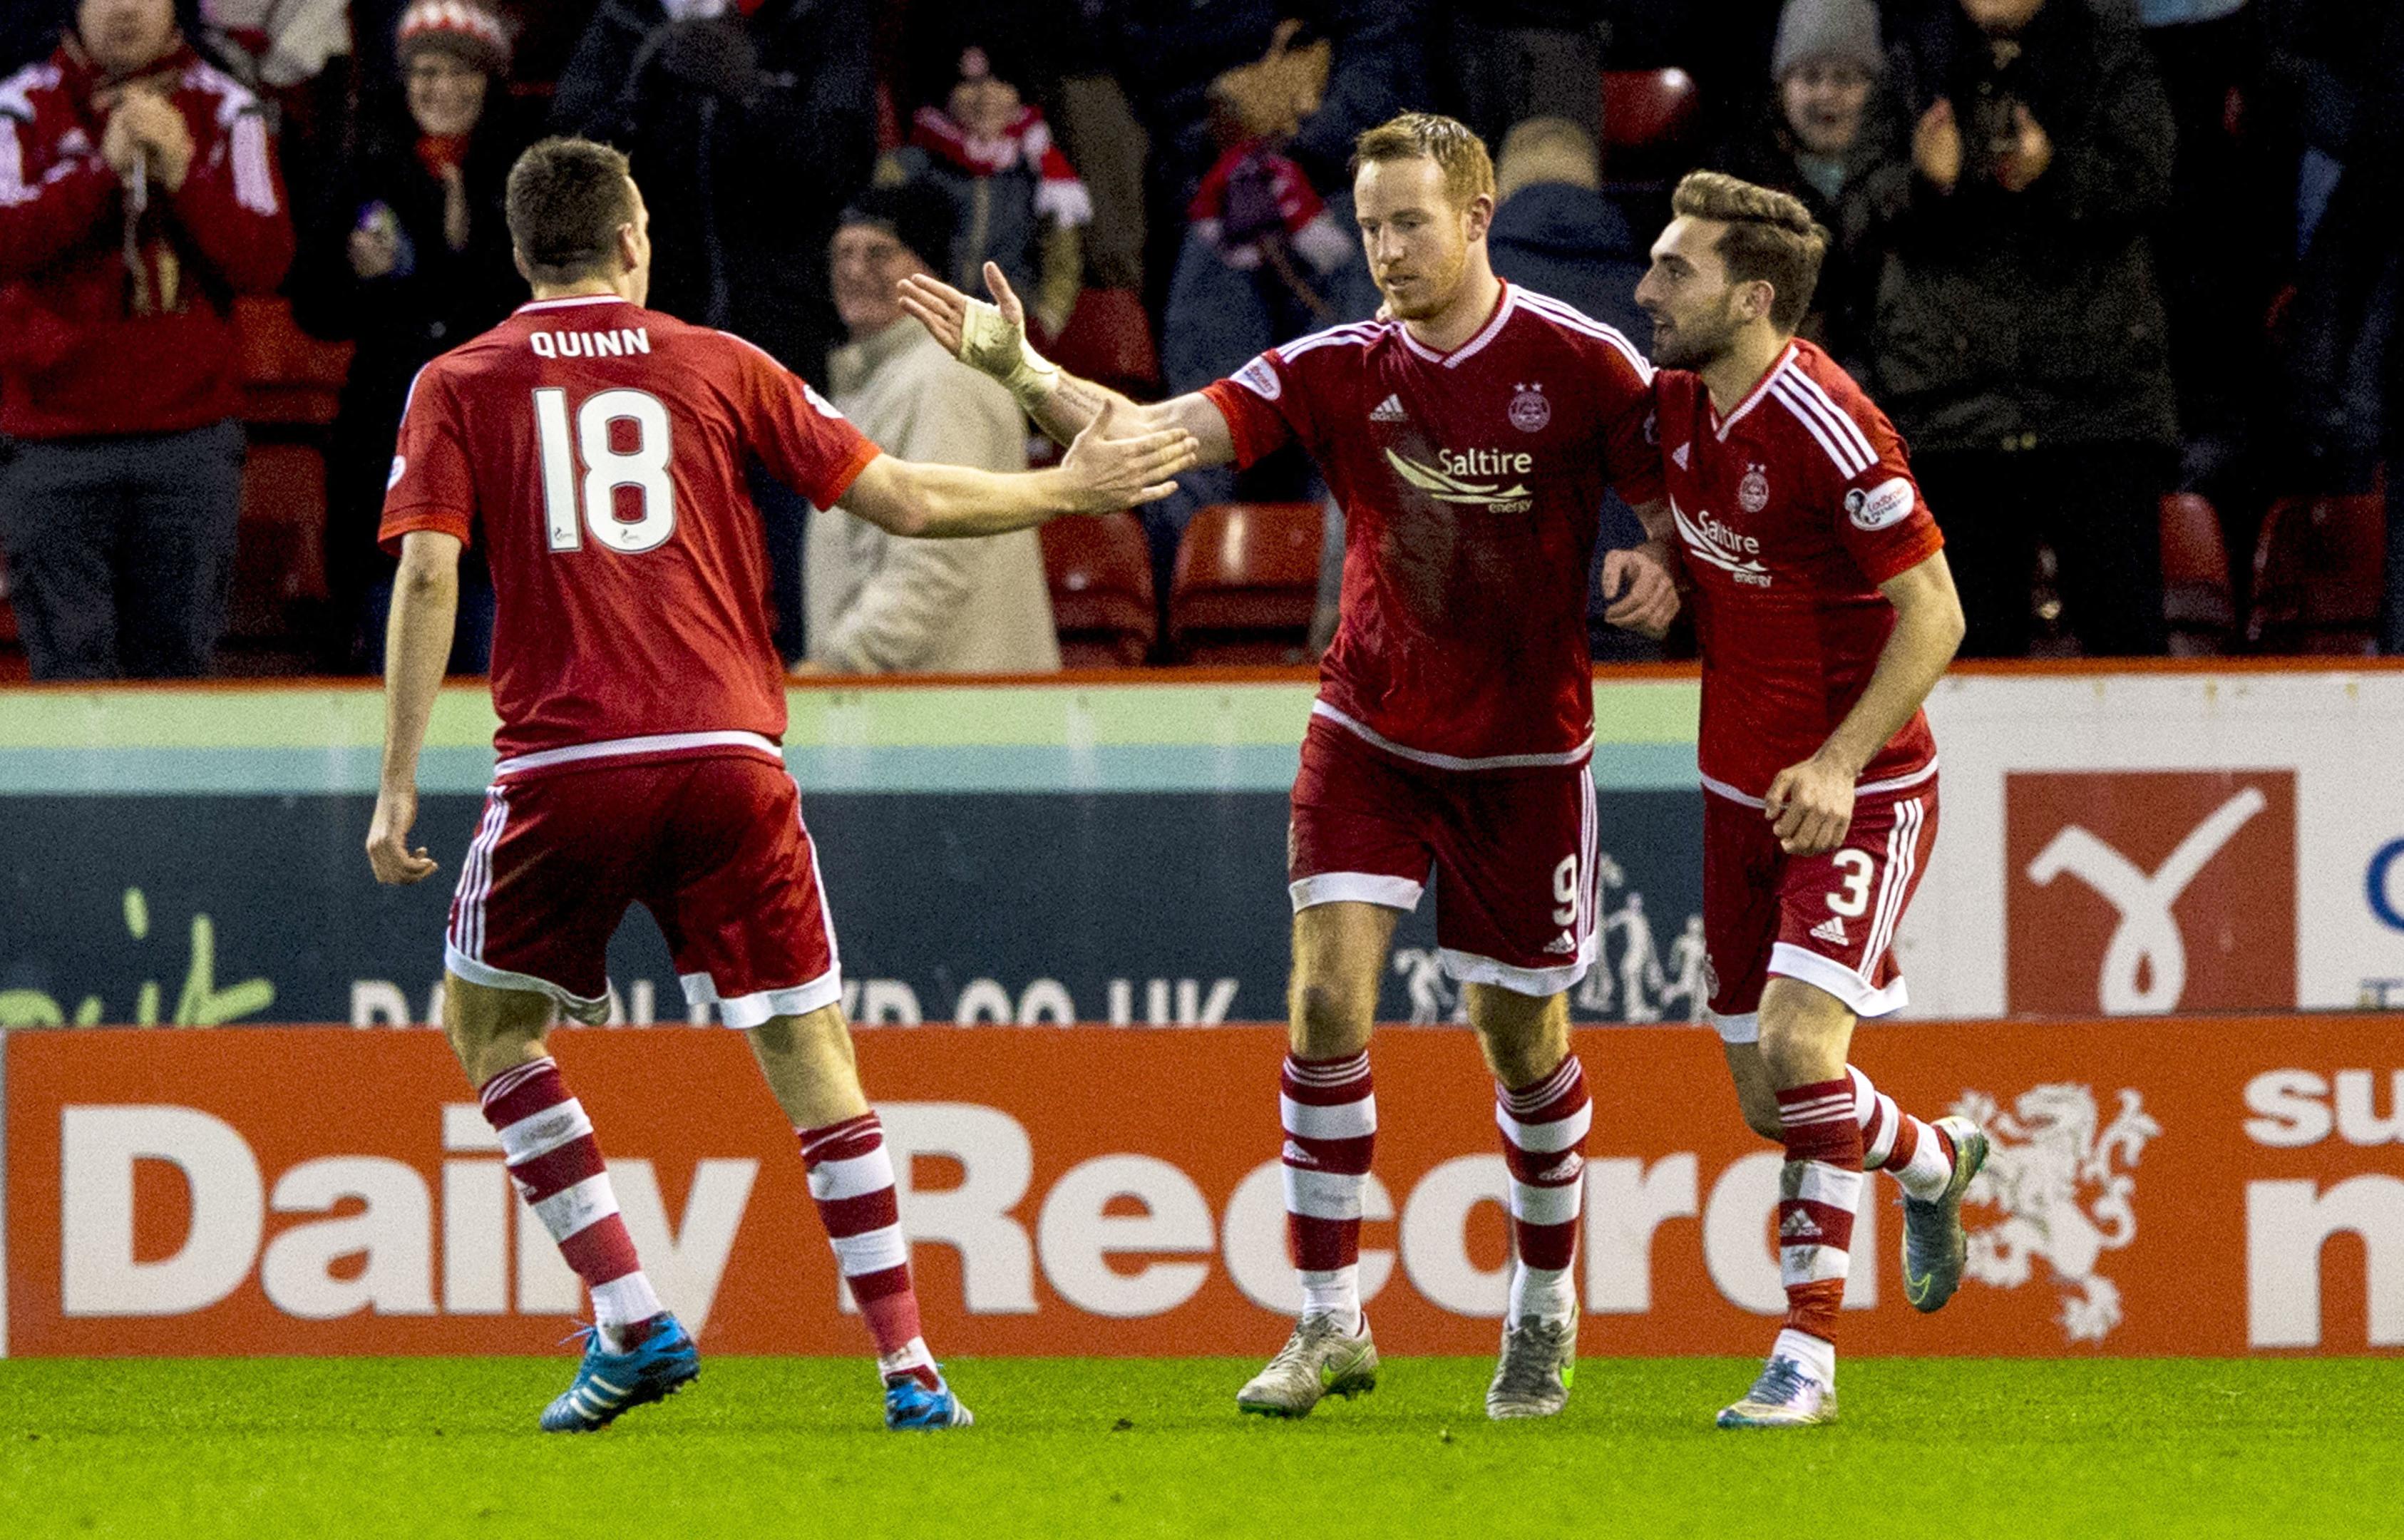 Aberdeen striker Adam Rooney (centre) celebrates his goal with team-mates Graeme Shinnie (right) and Paul Quinn